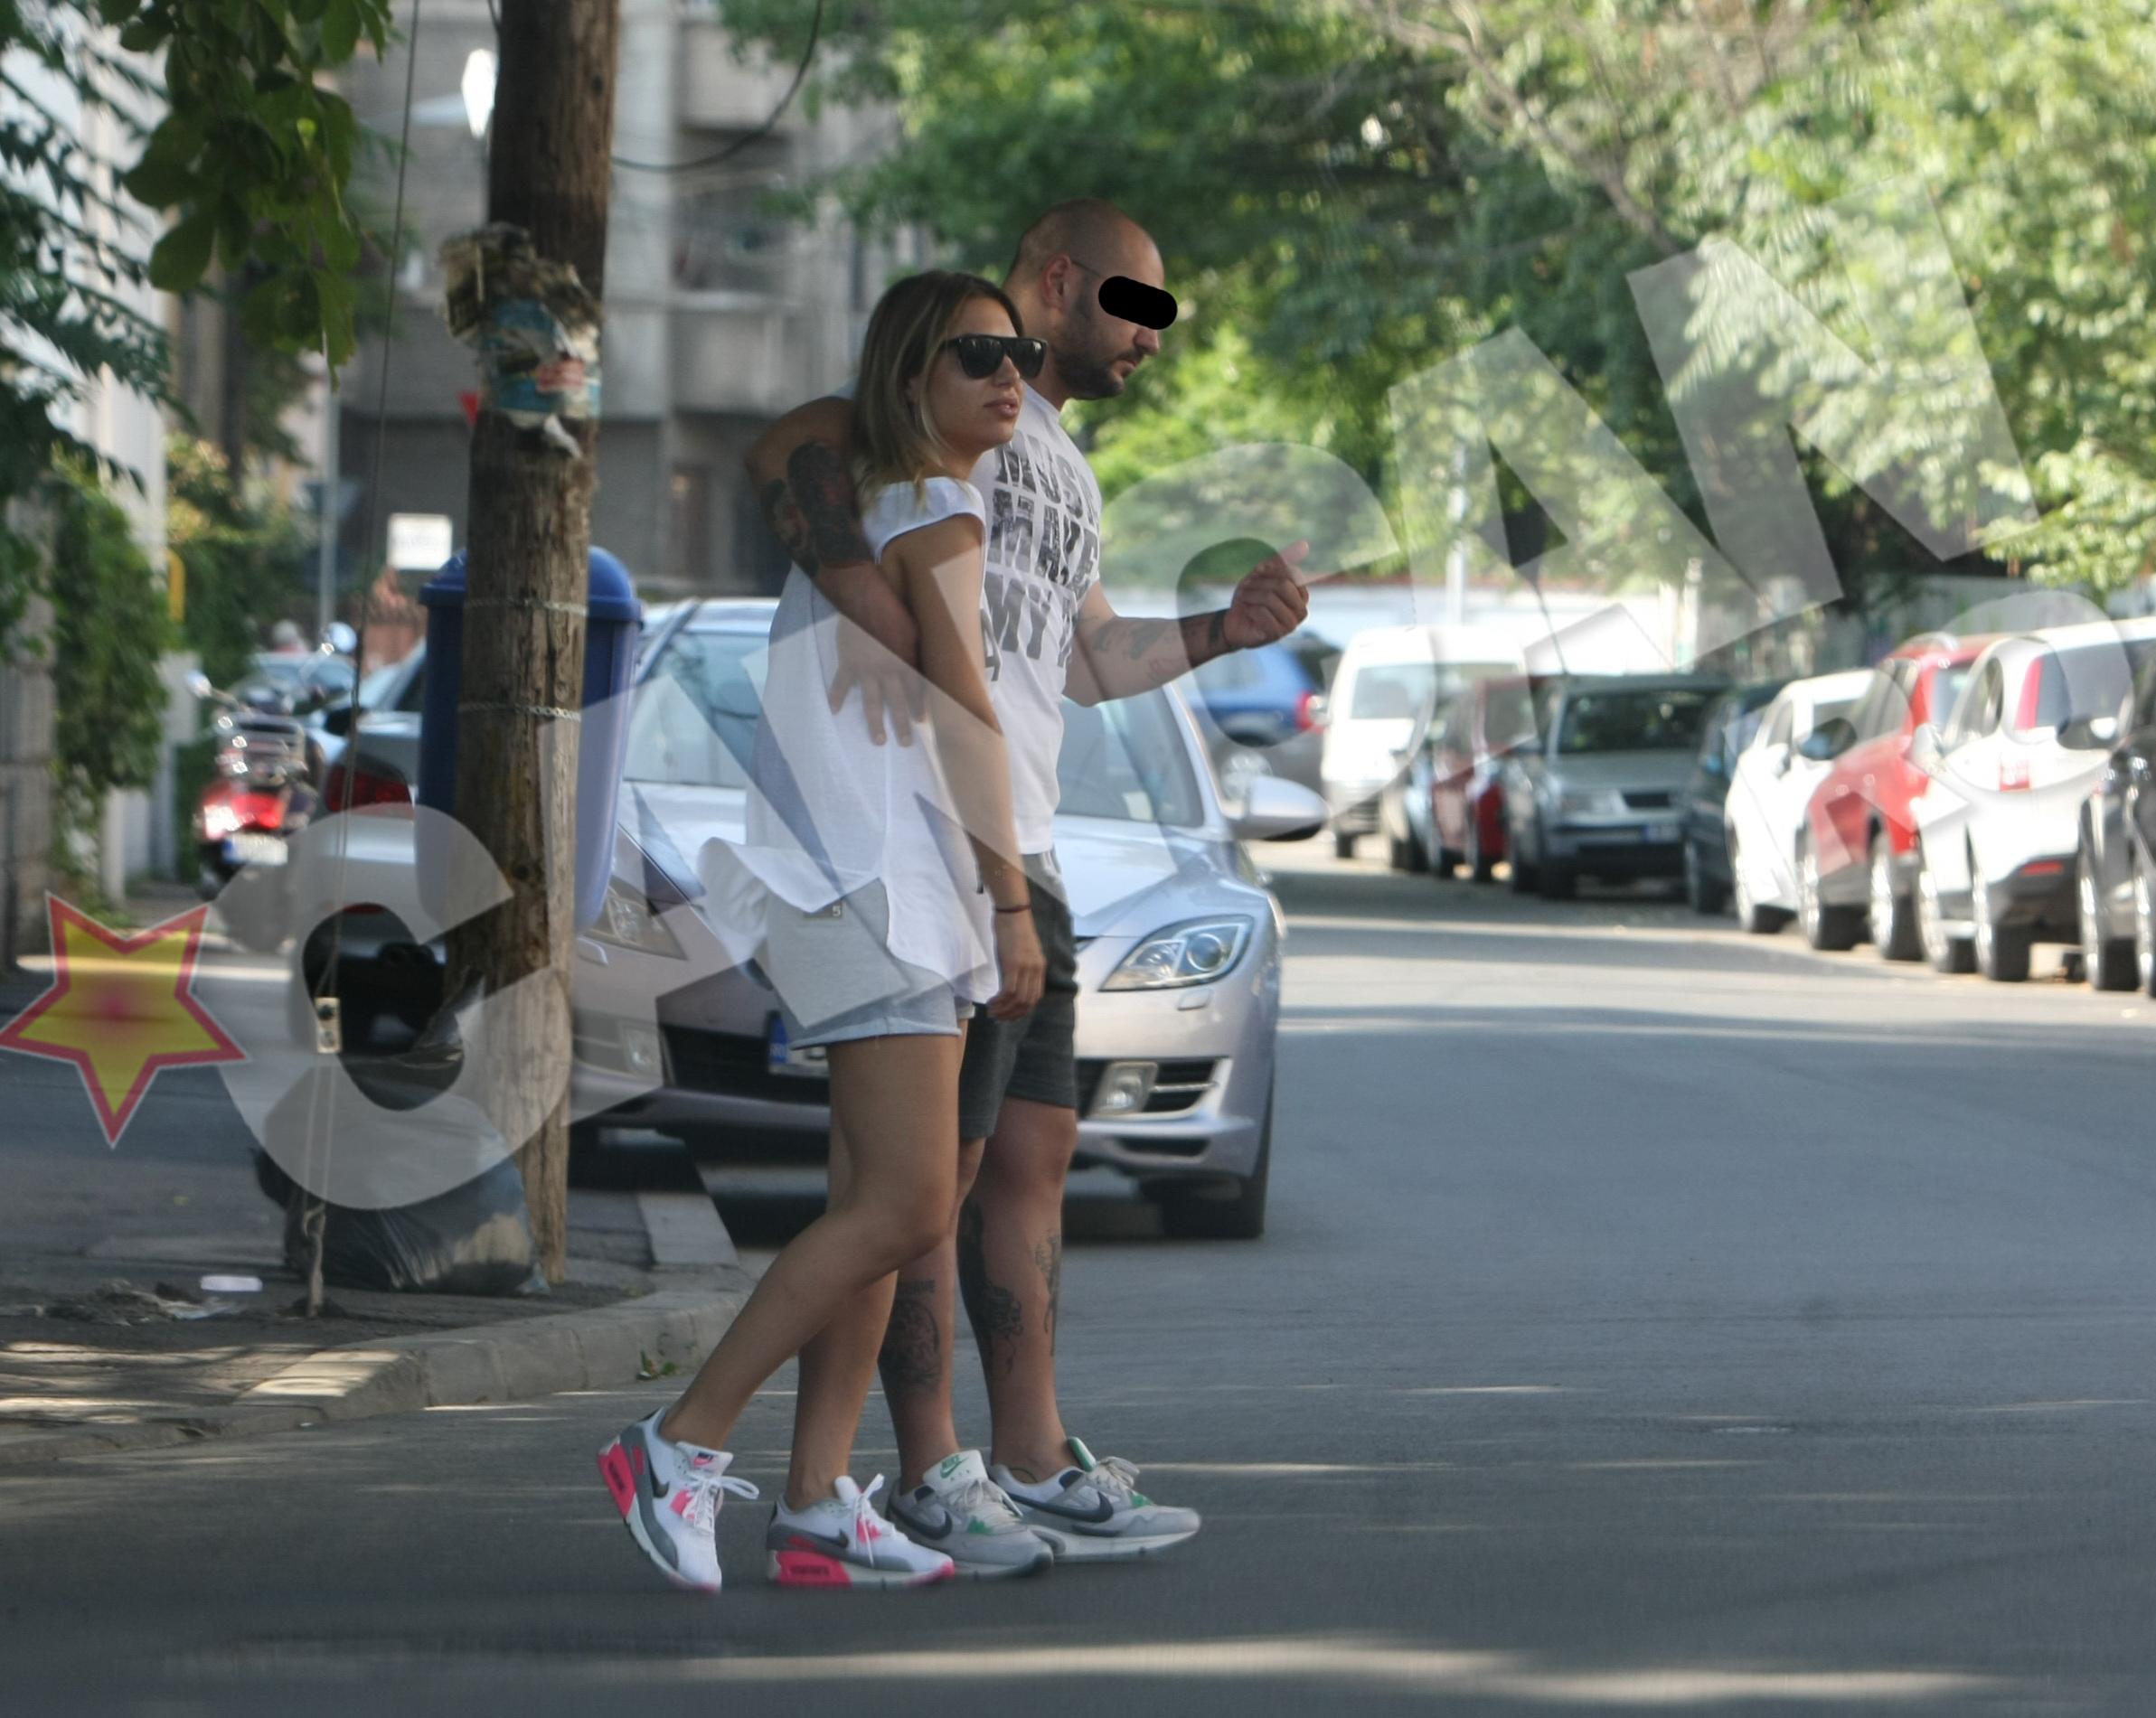 Inainte de a traversa, sportivul isi tine ocrotitor iubita in brate, asigurandu-se ca nu trece nicio masina